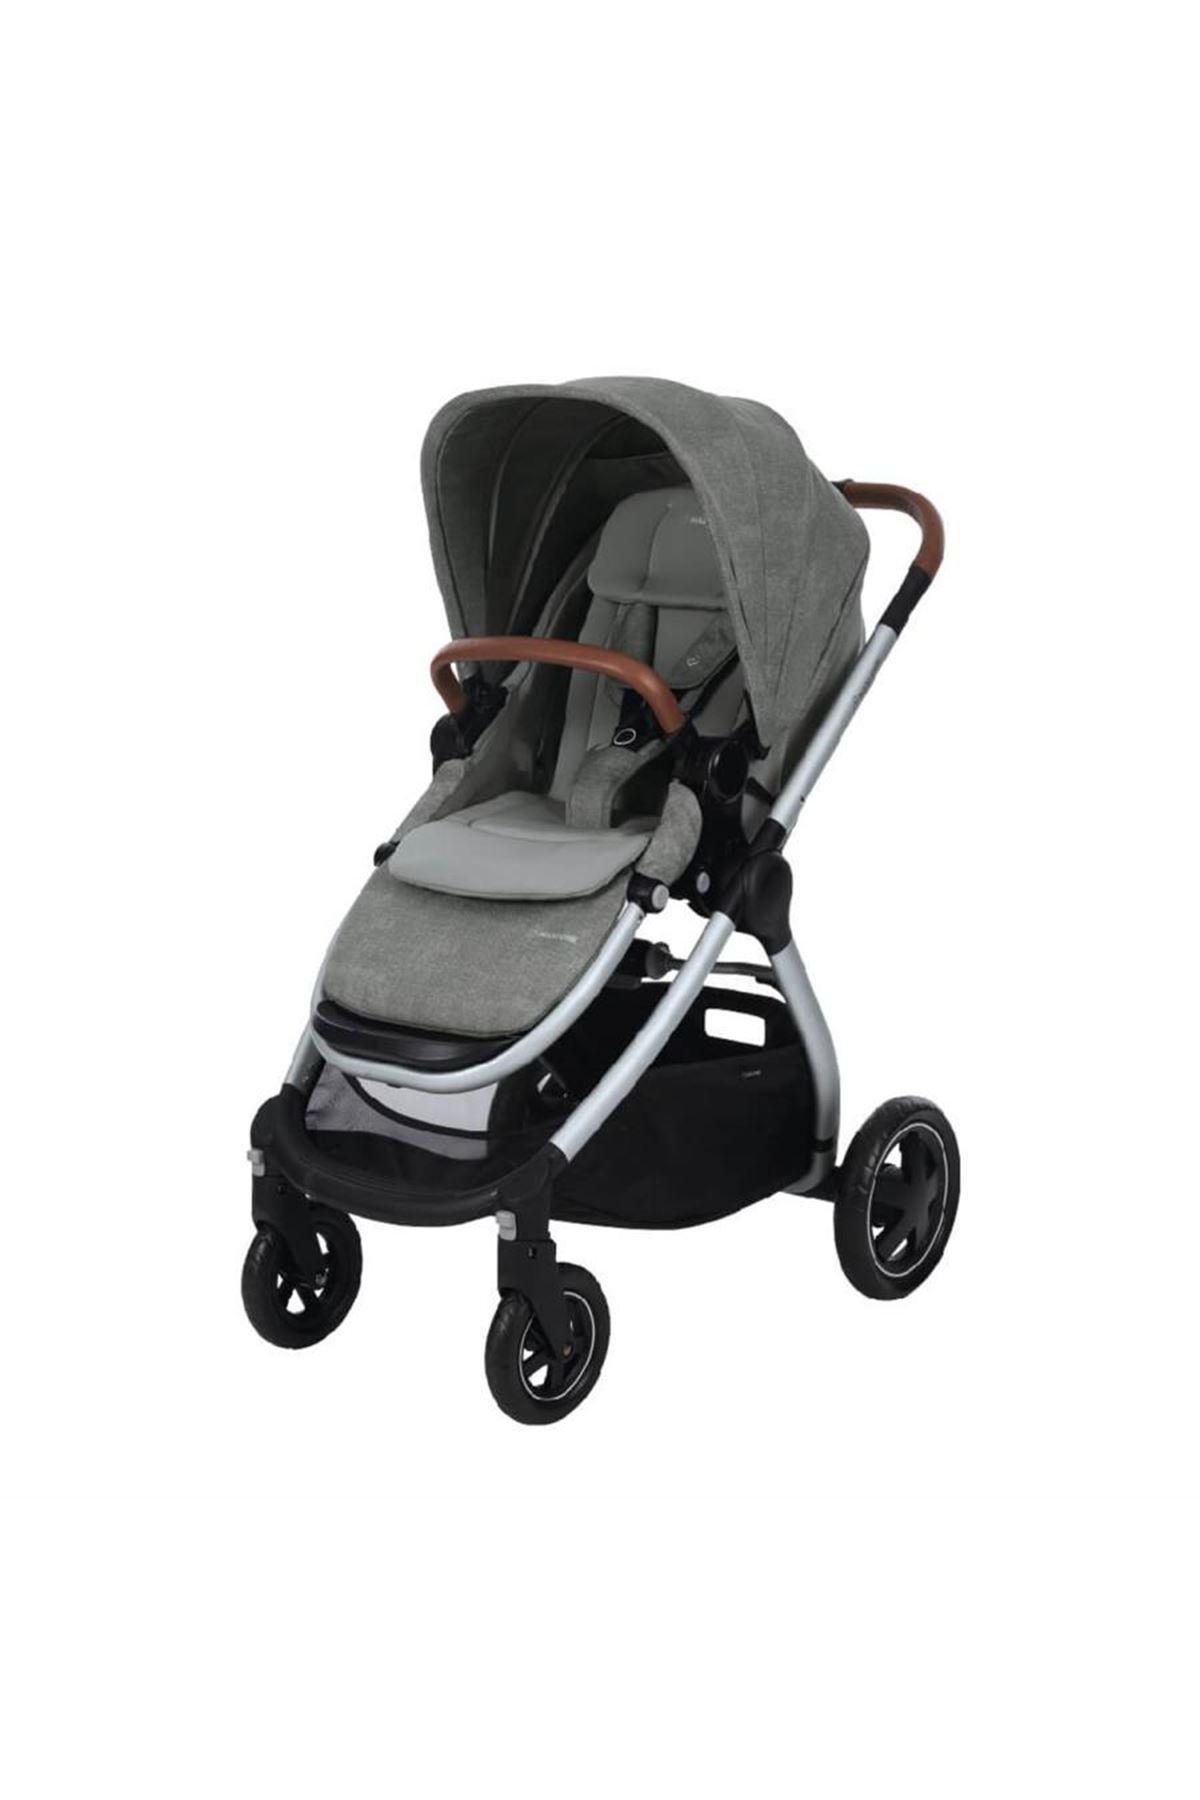 Maxi-Cosi Adorra - Coral Travel Sistem Bebek Arabası / Nomad Grey